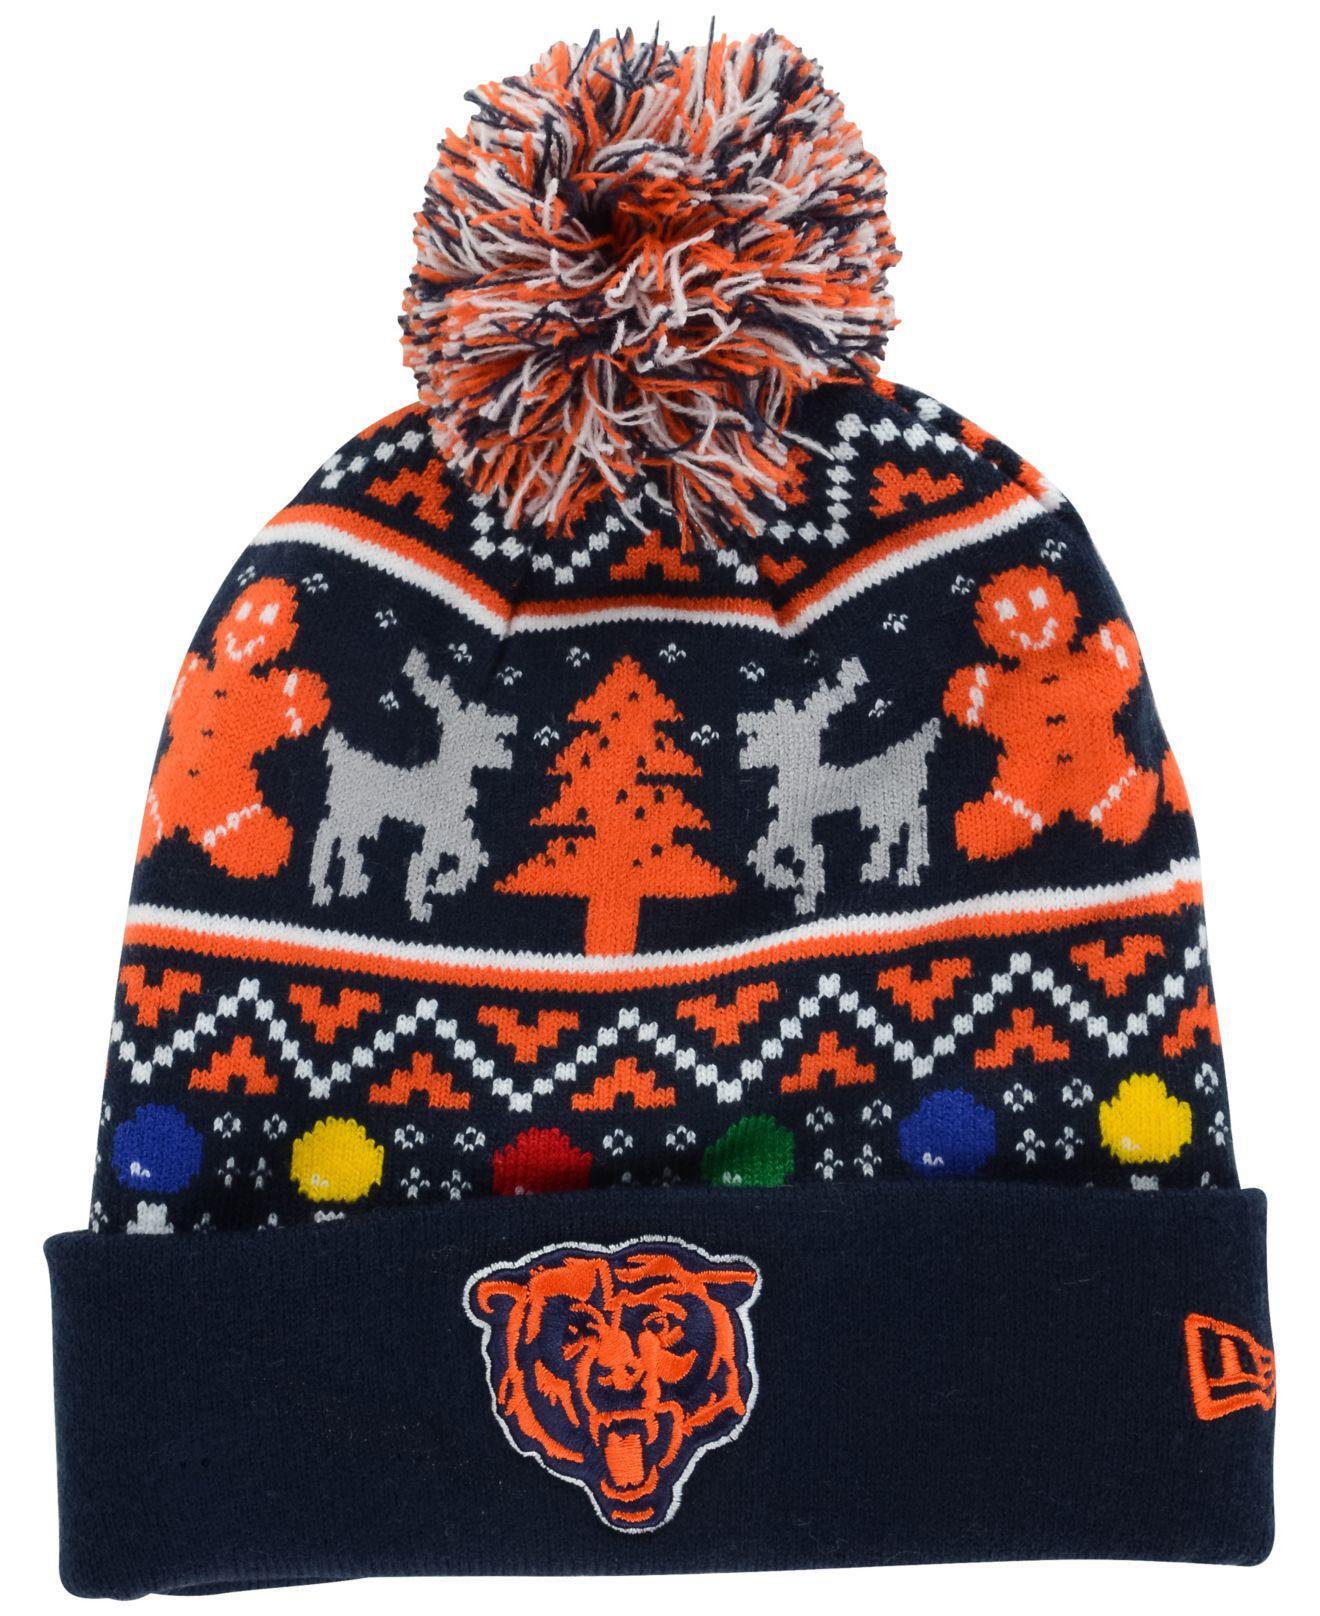 Lyst - KTZ Chicago Bears Christmas Sweater Pom Knit Hat for Men af288a711470